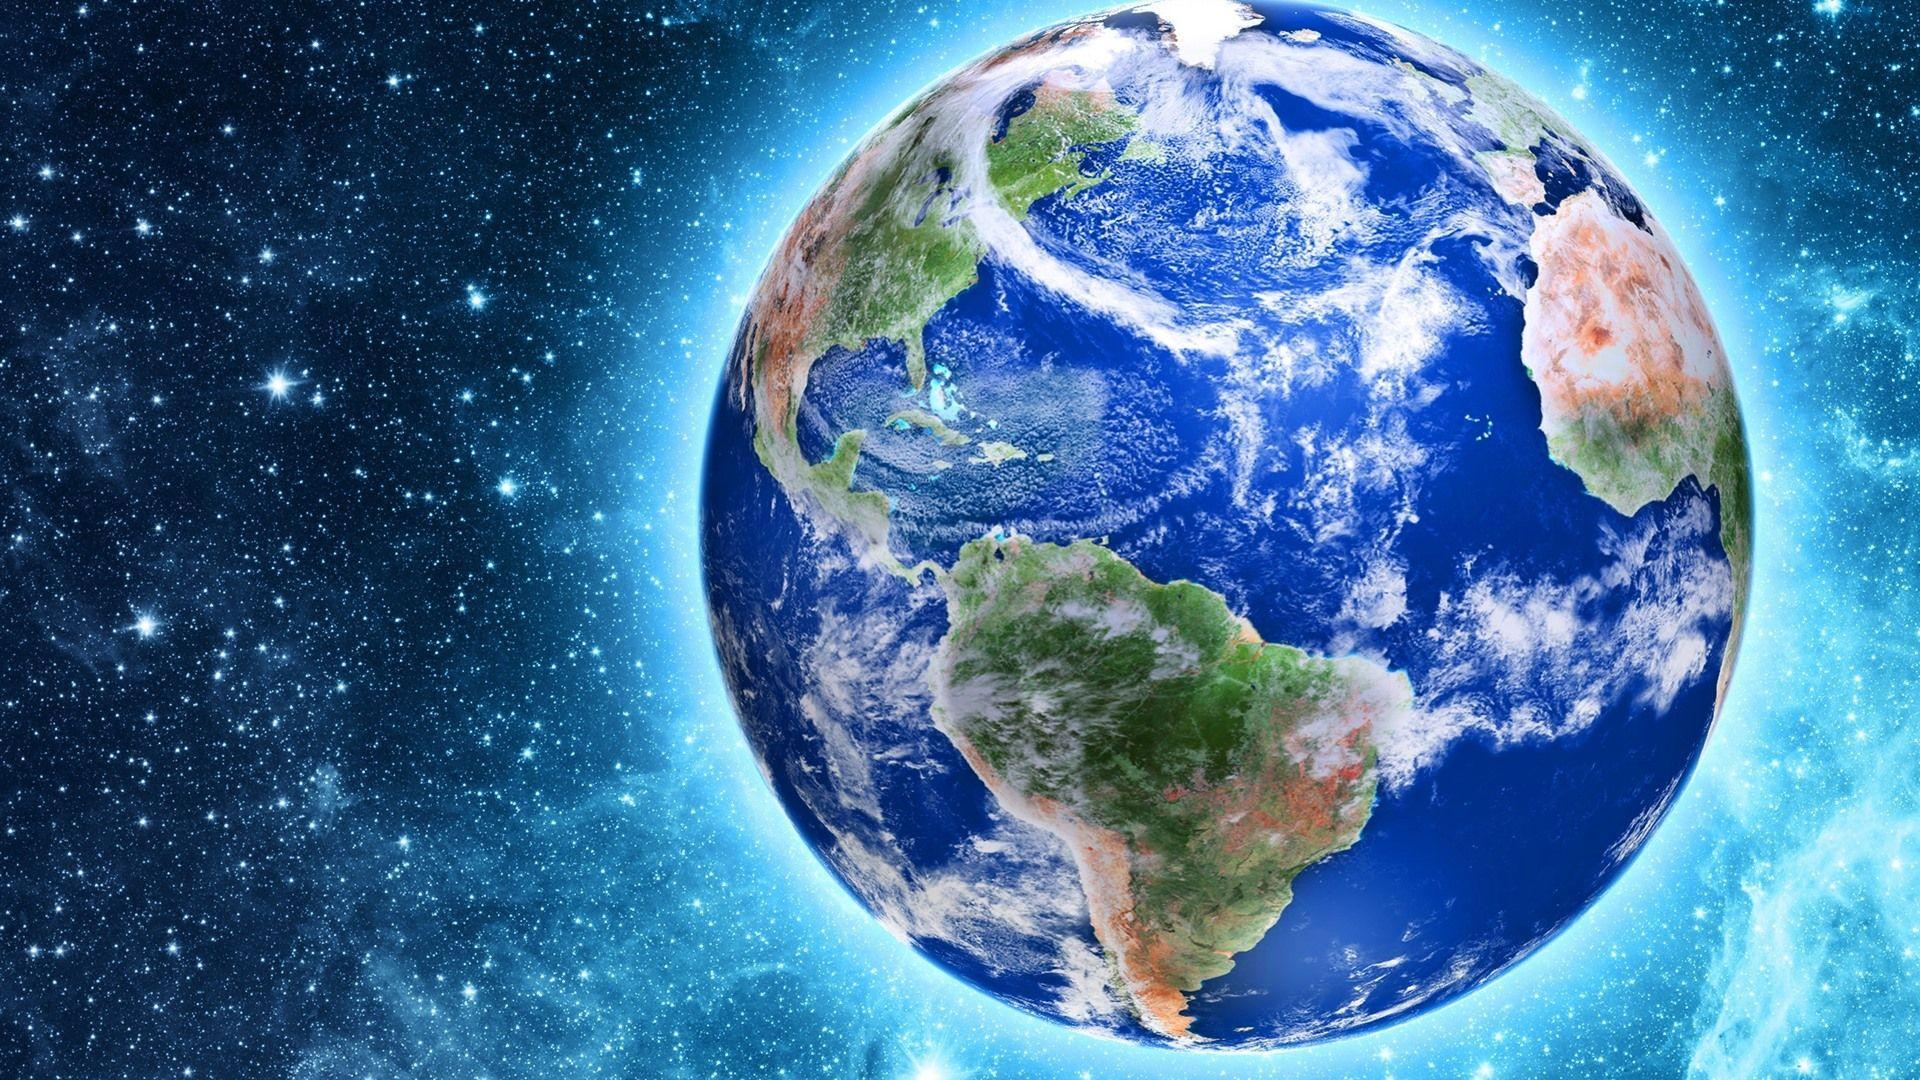 Beautiful Earth Wallpapers - Top Free Beautiful Earth Backgrounds -  WallpaperAccess